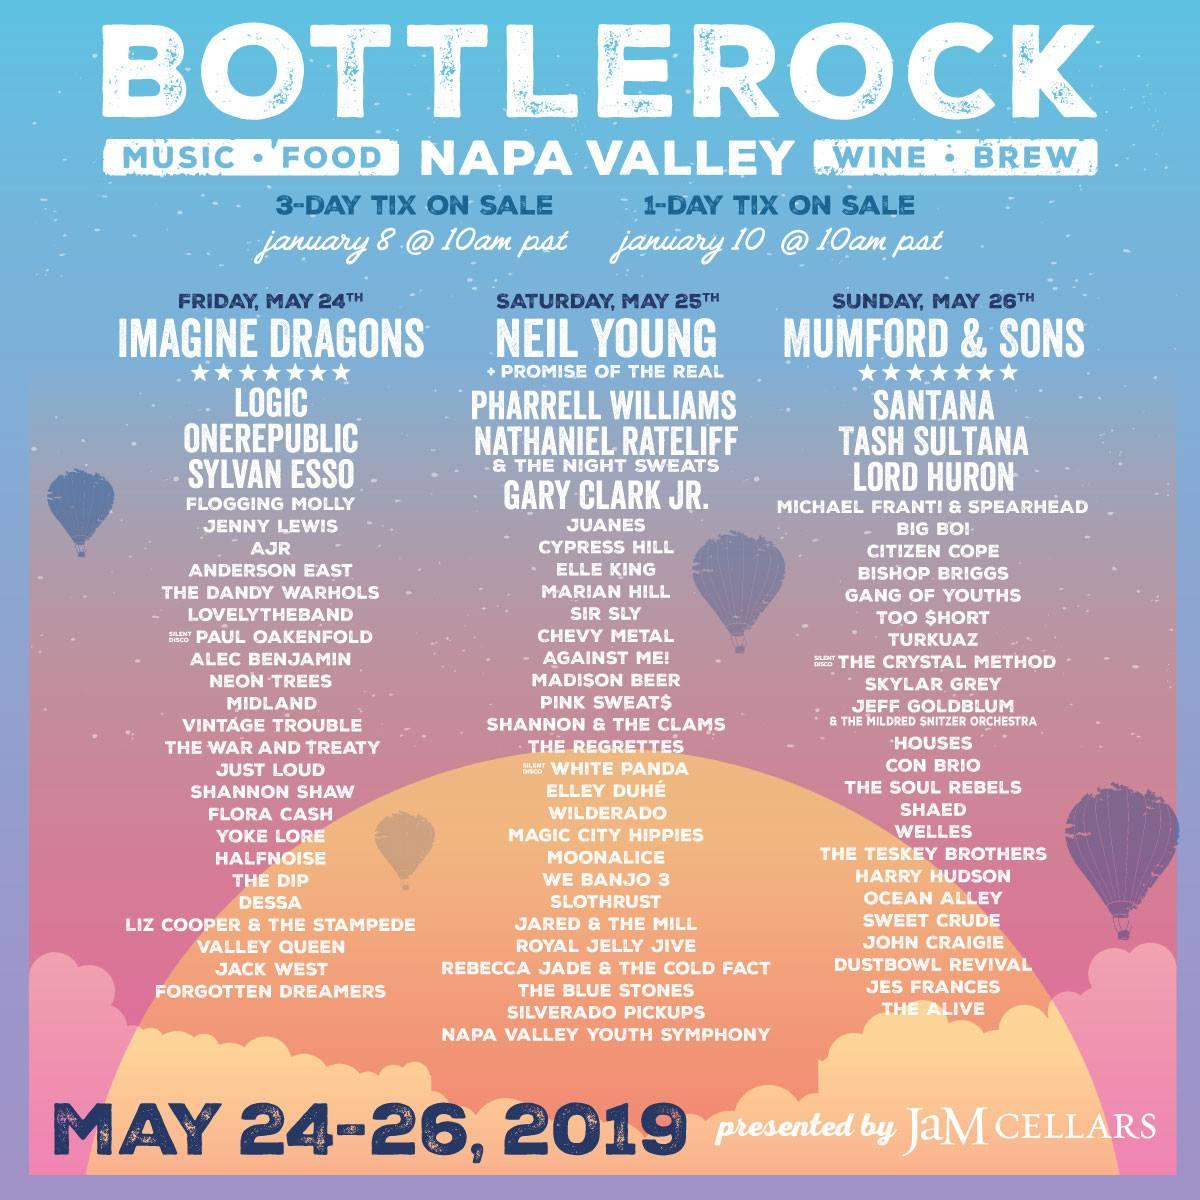 See you in May, Napa 🙌🏾 @BottleRockNapa https://t.co/pivgWtCPQZ